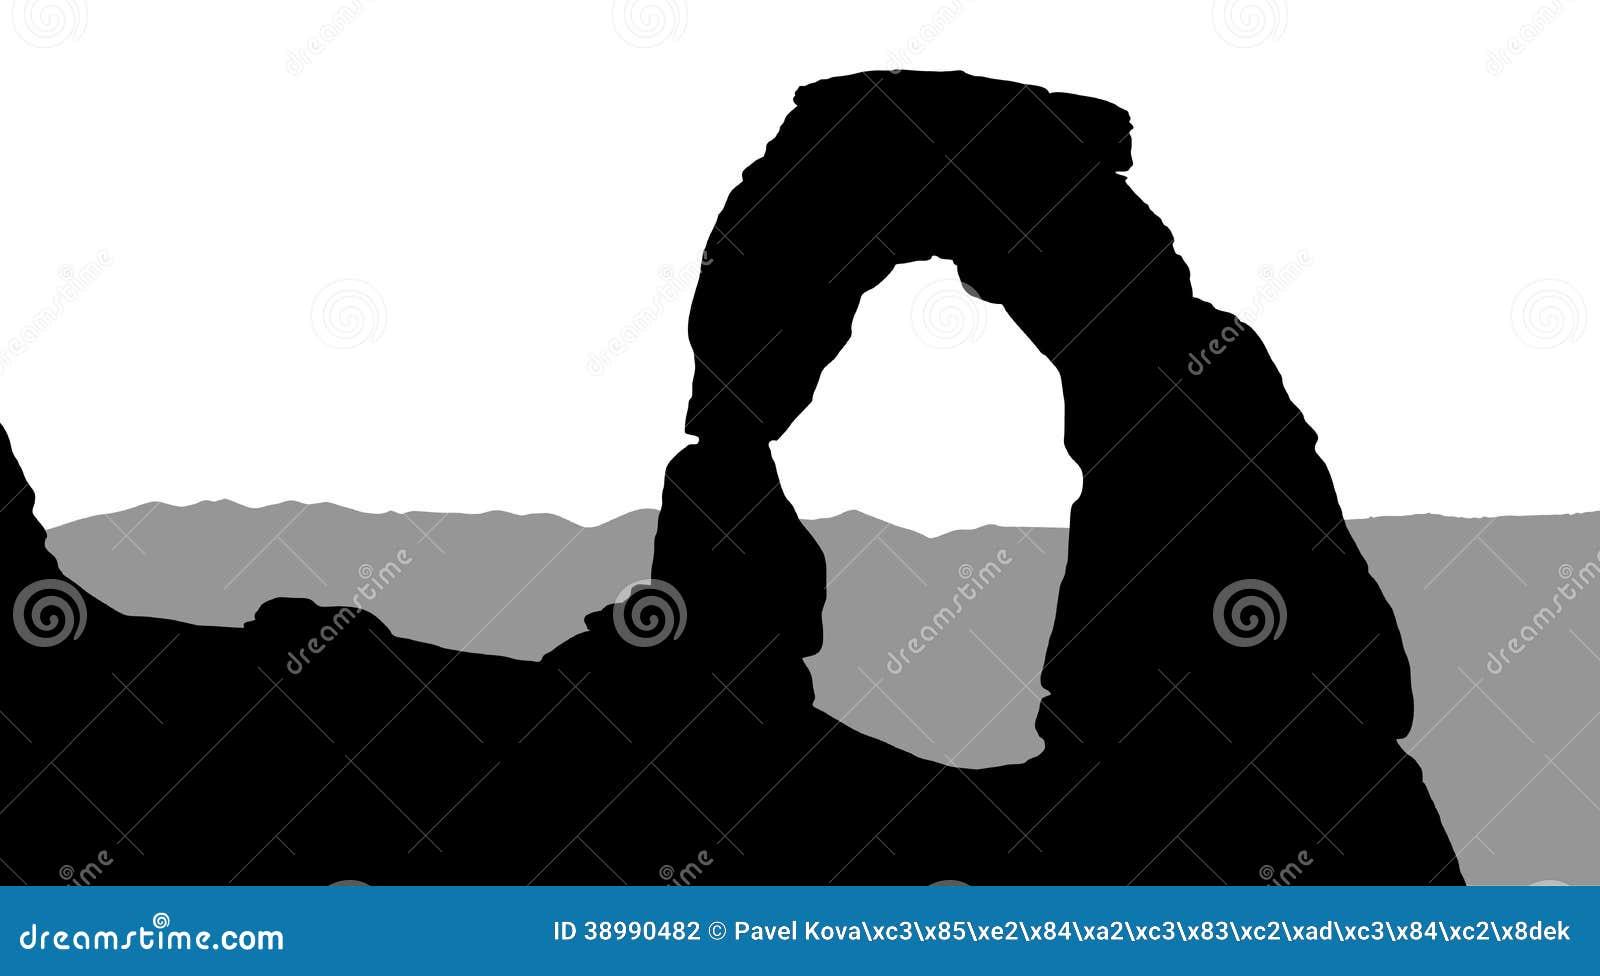 Arches National Park Vector Illustration Utah Stock Vector ...  |Clipart National Park Utah